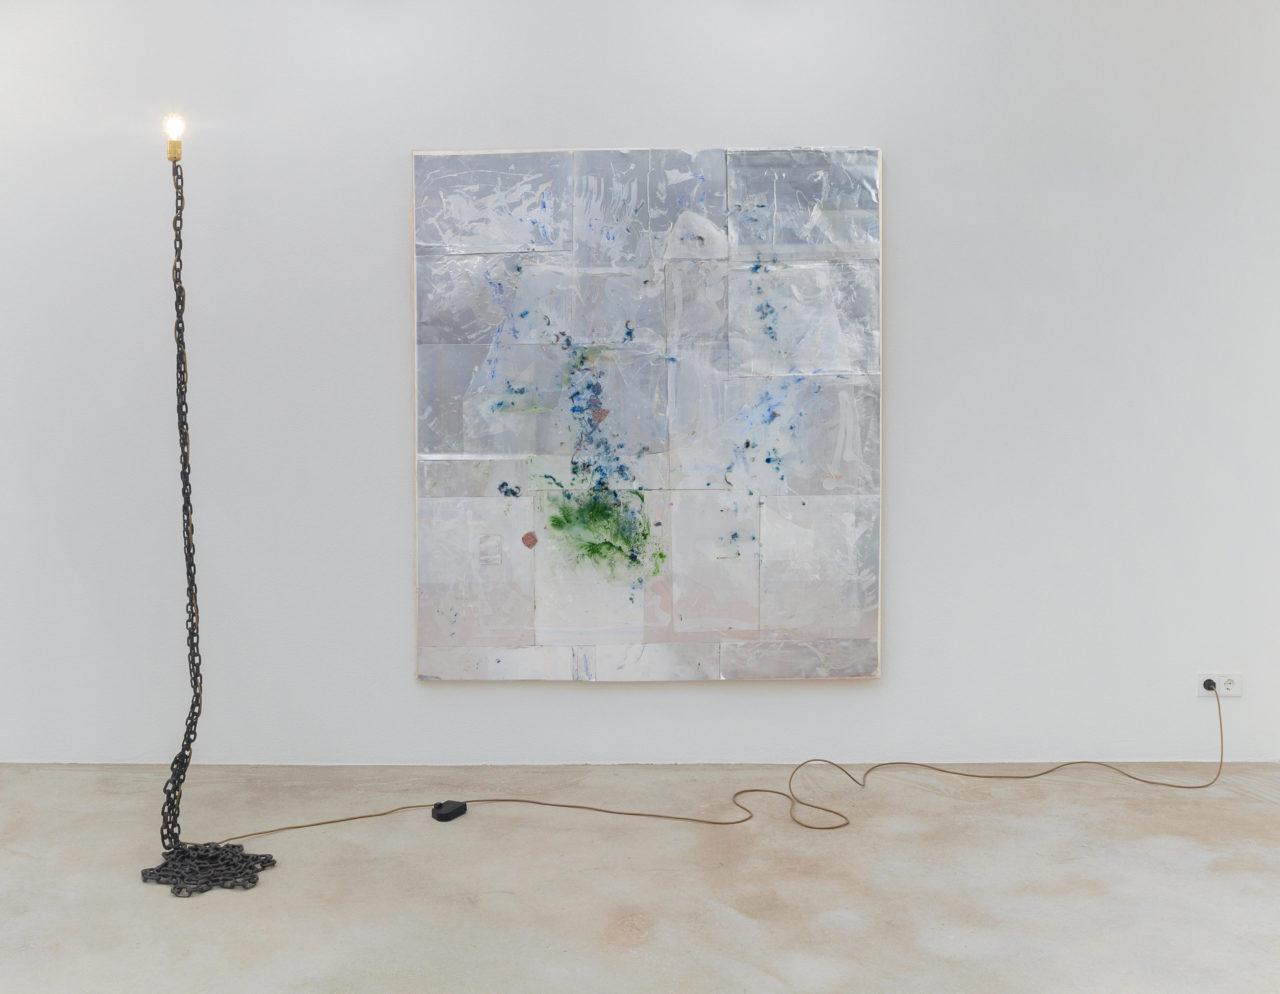 Left: Franz West, Lampe des Künstlers II (1989); Wall: Rudolf Polanszky, untitled, Rekonstruktionen (2006)